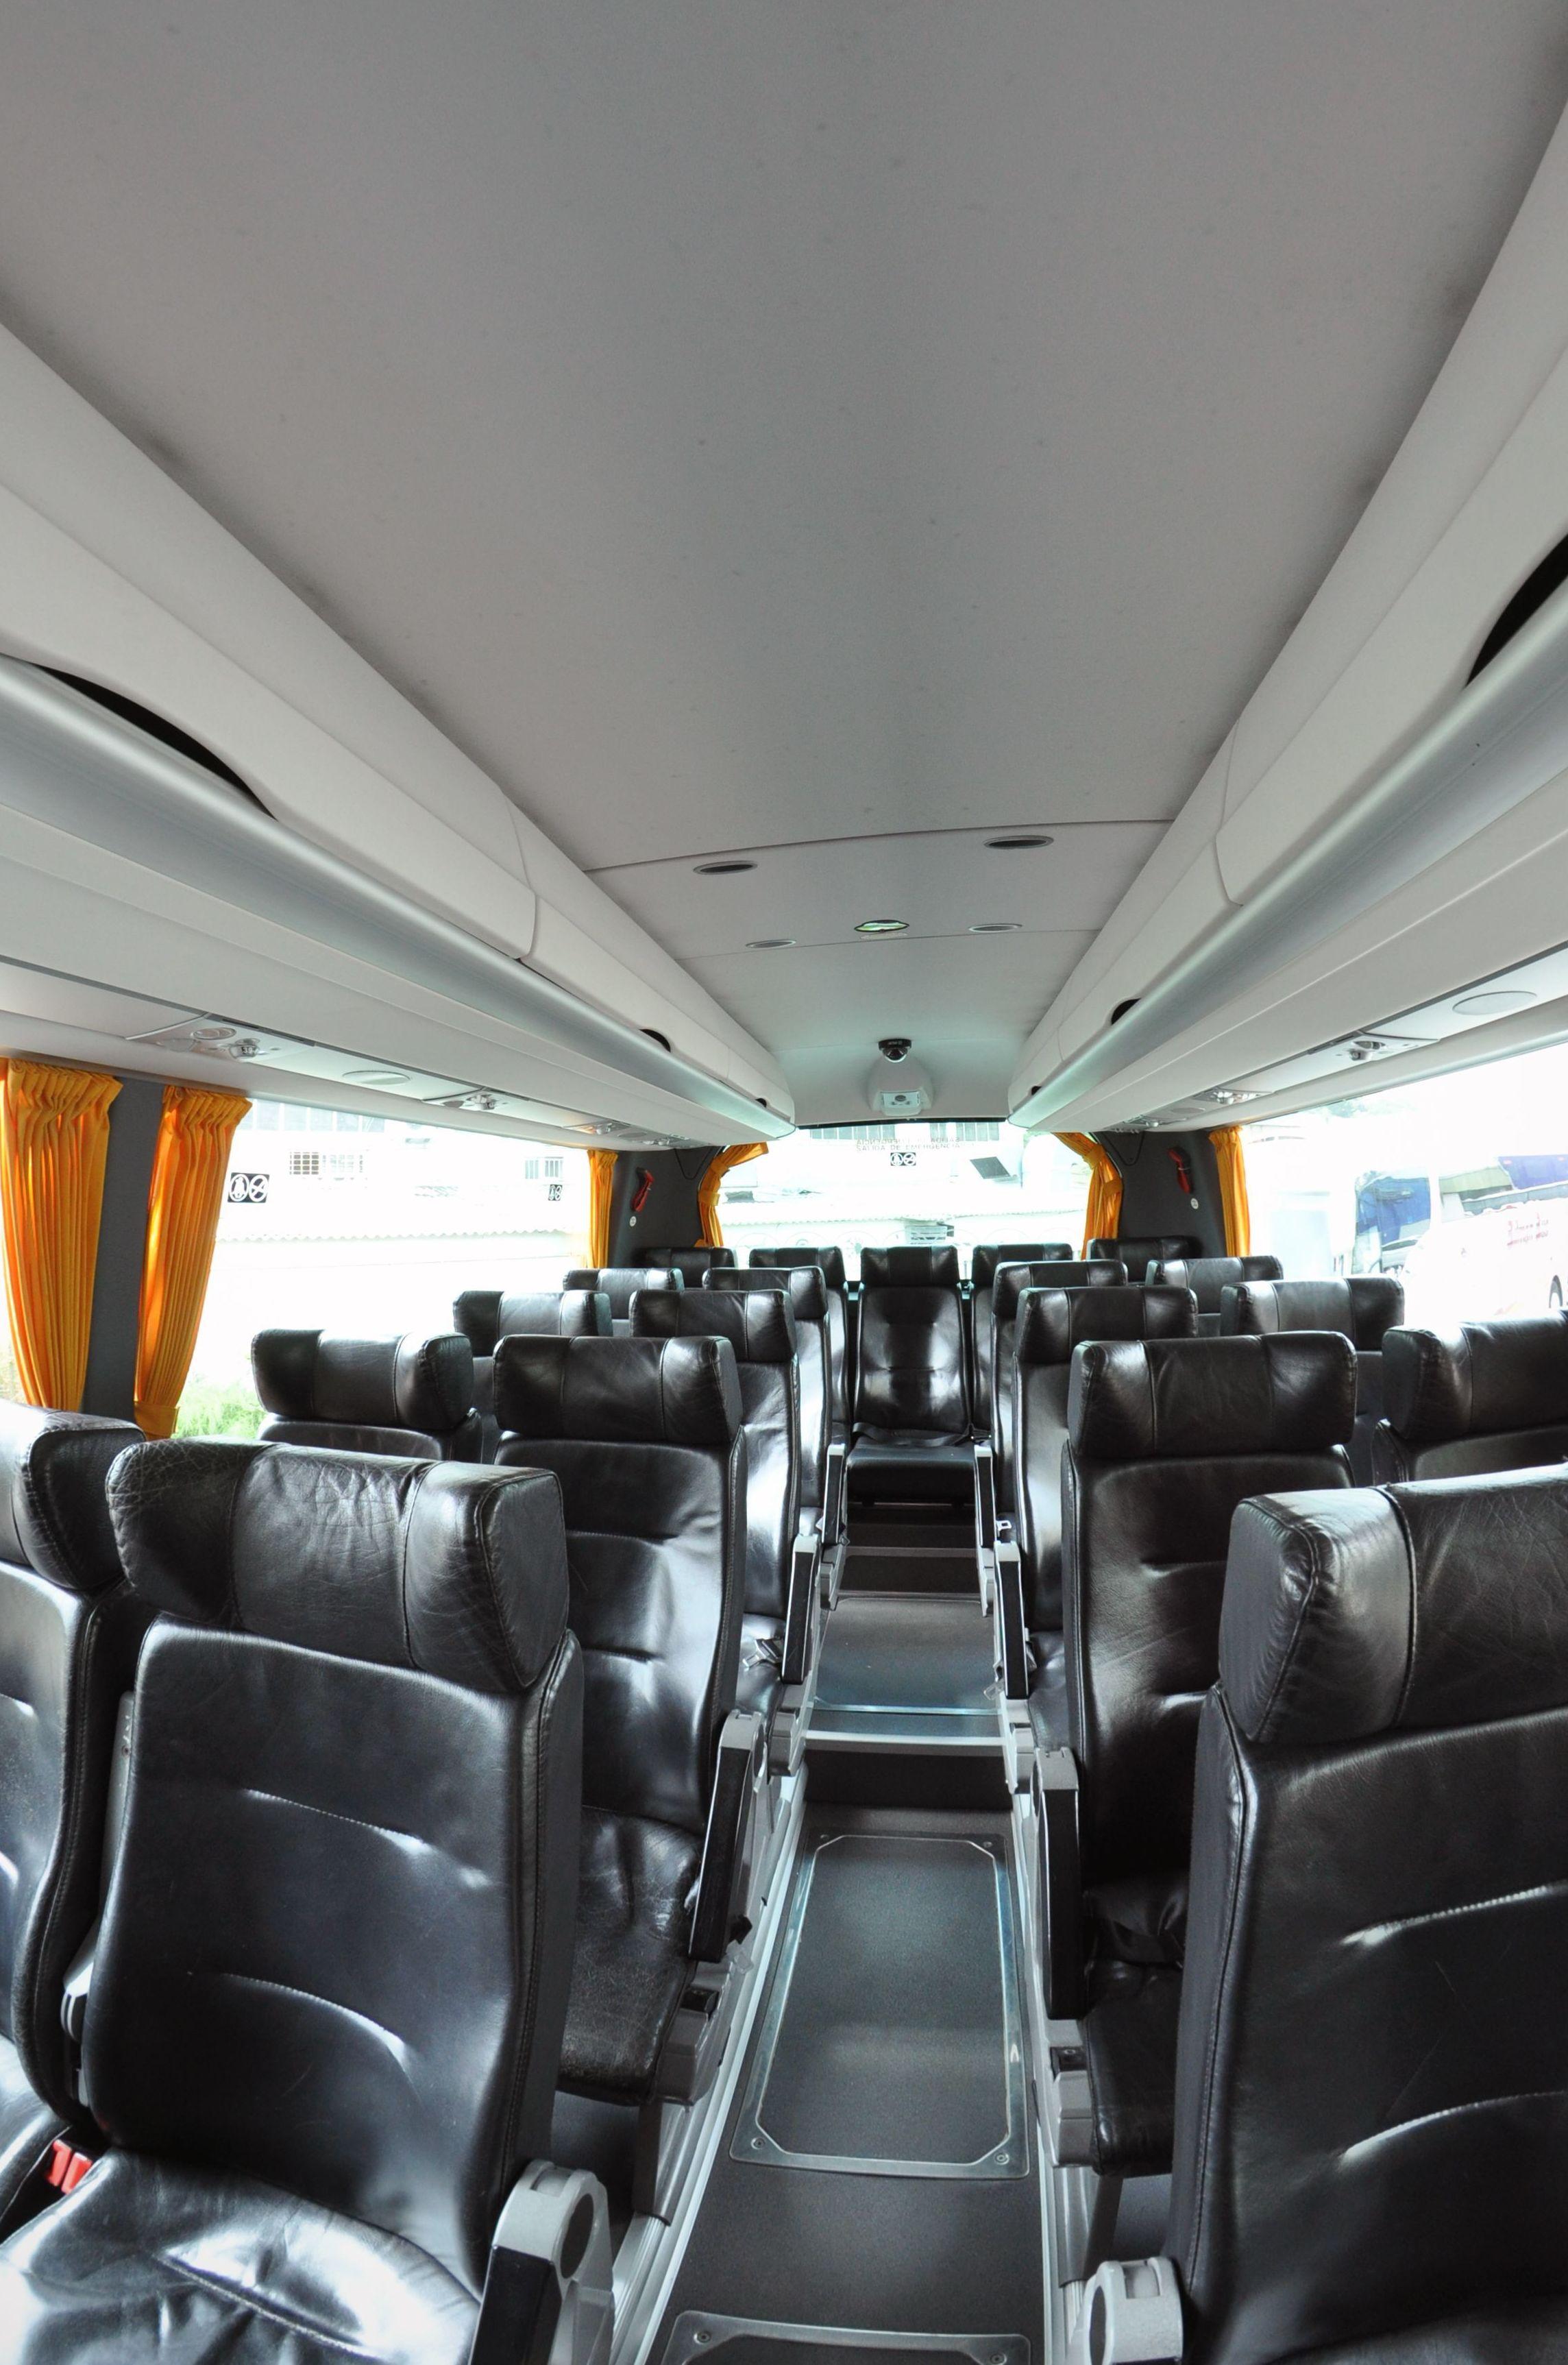 Viajes en autocar. Cantabria